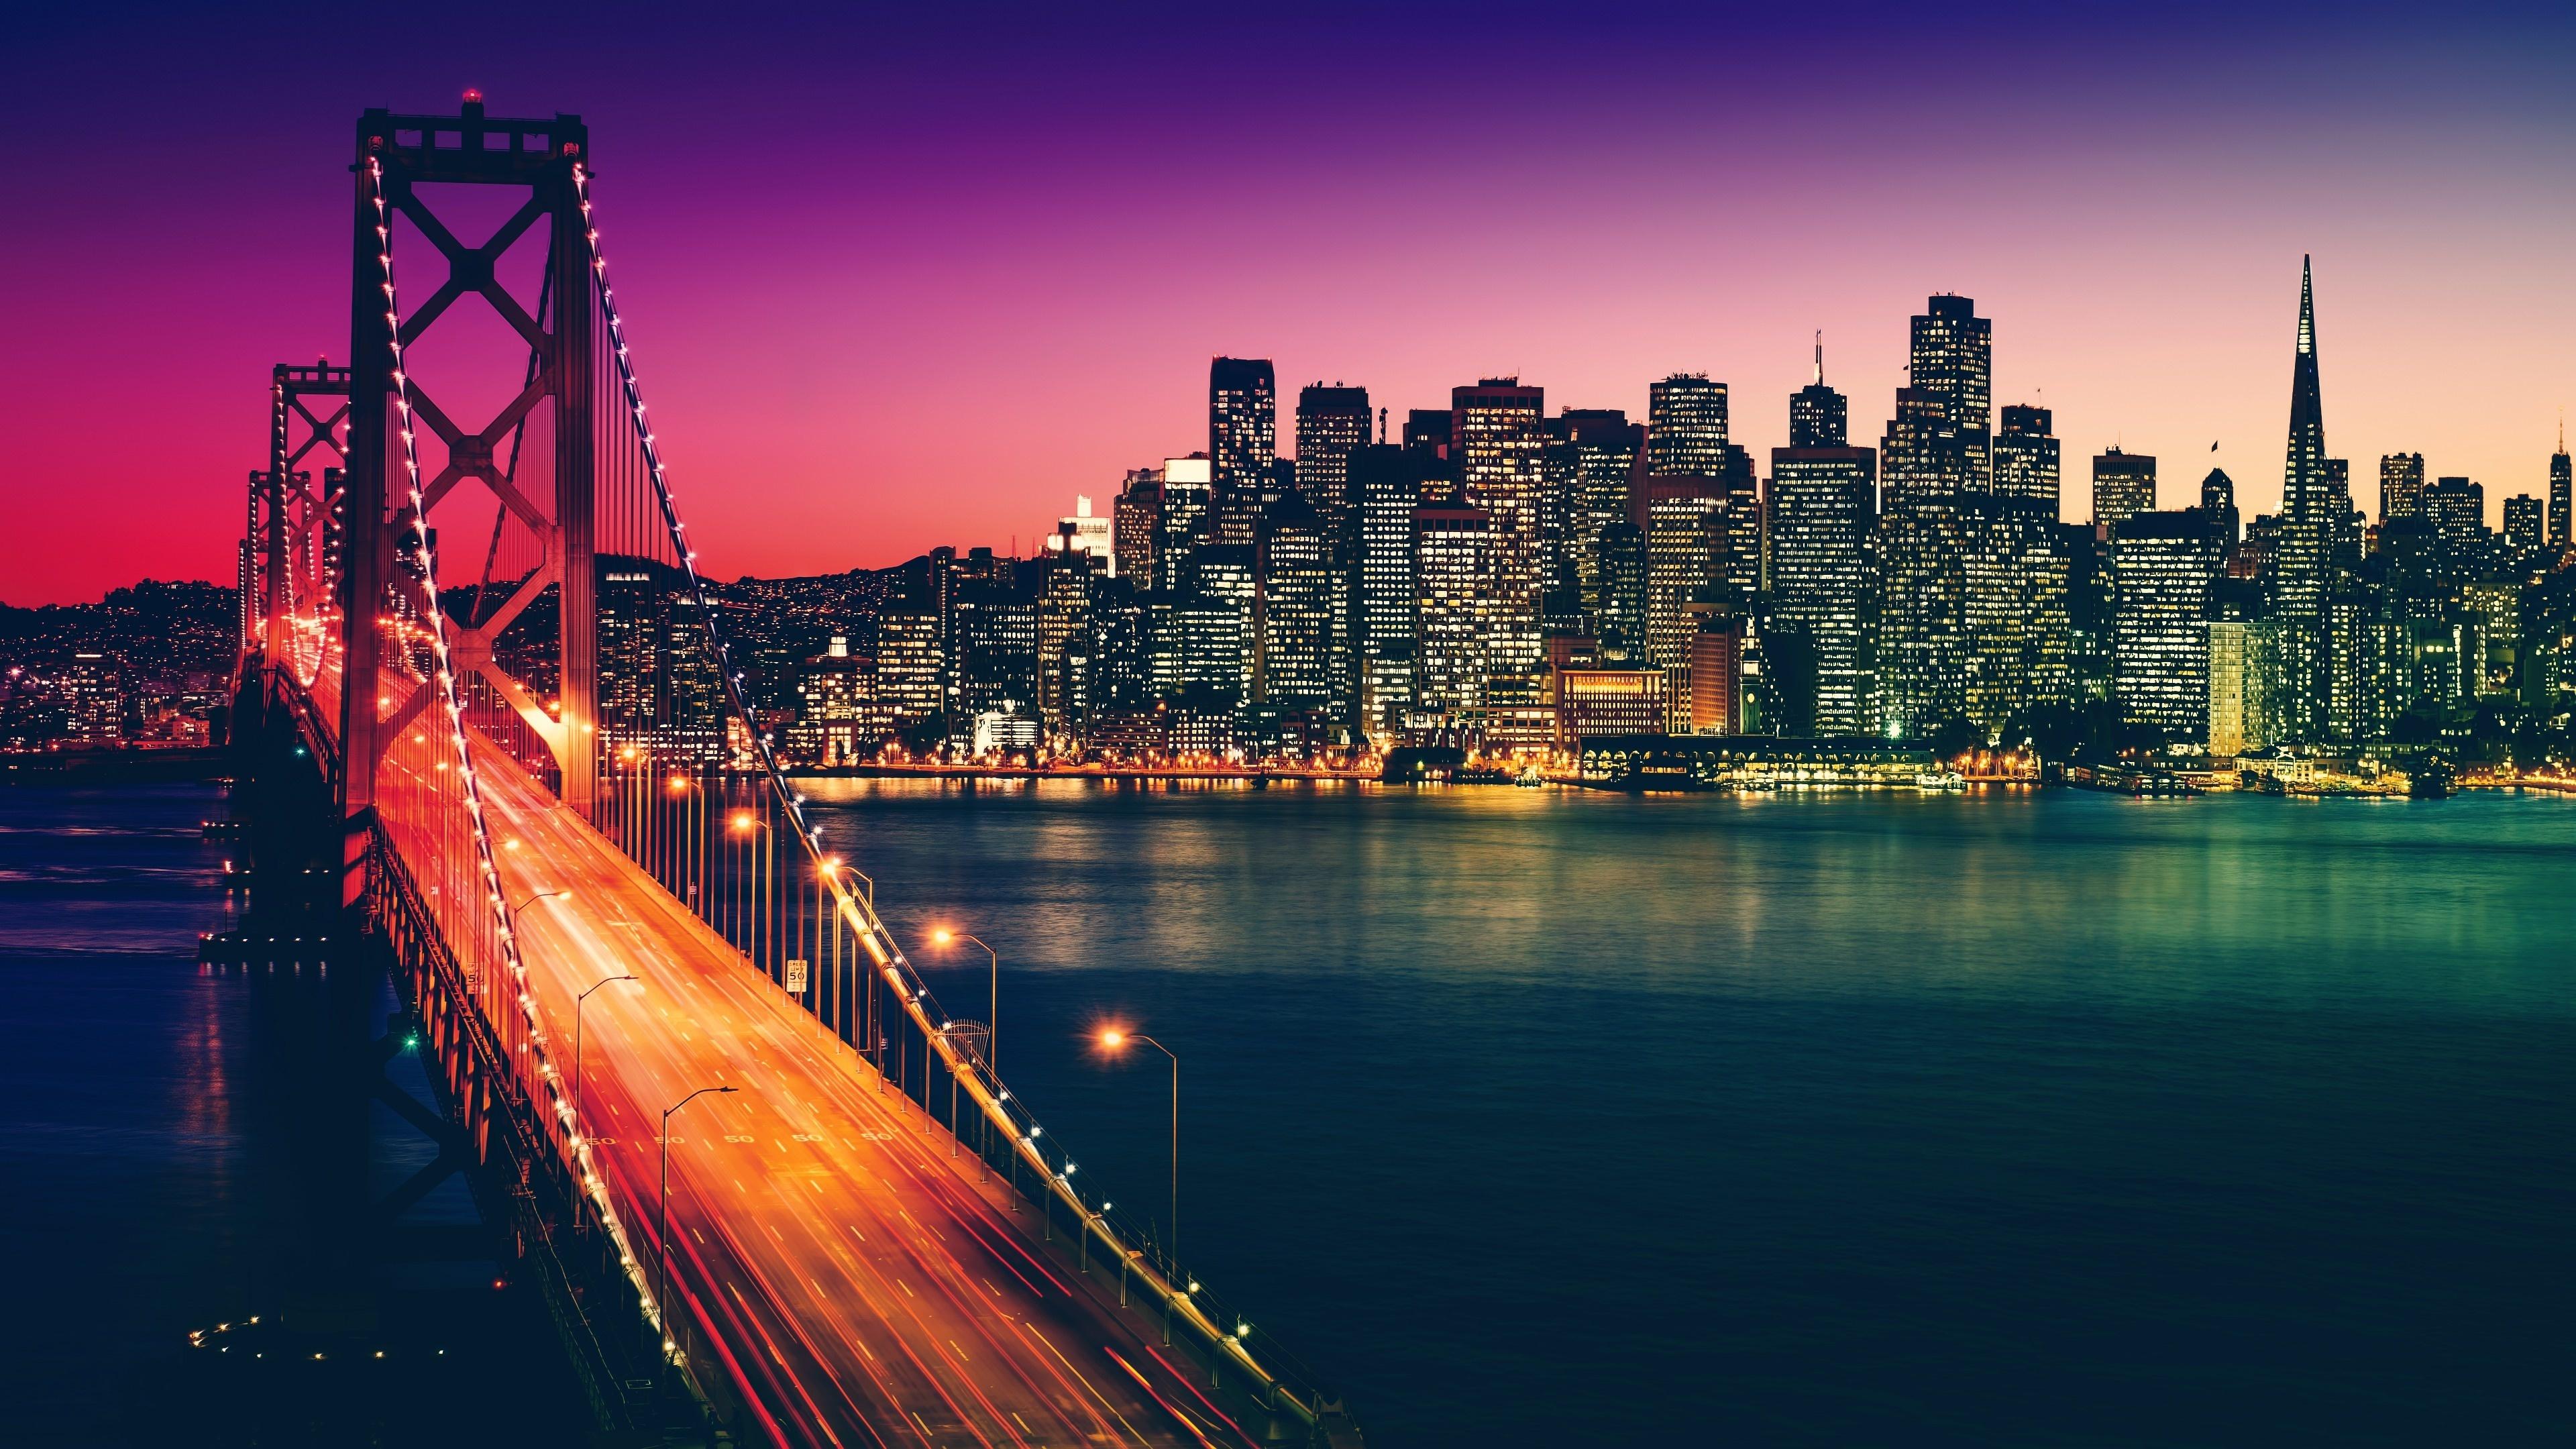 Download 3840x2400 Wallpaper San Francisco City Buildings